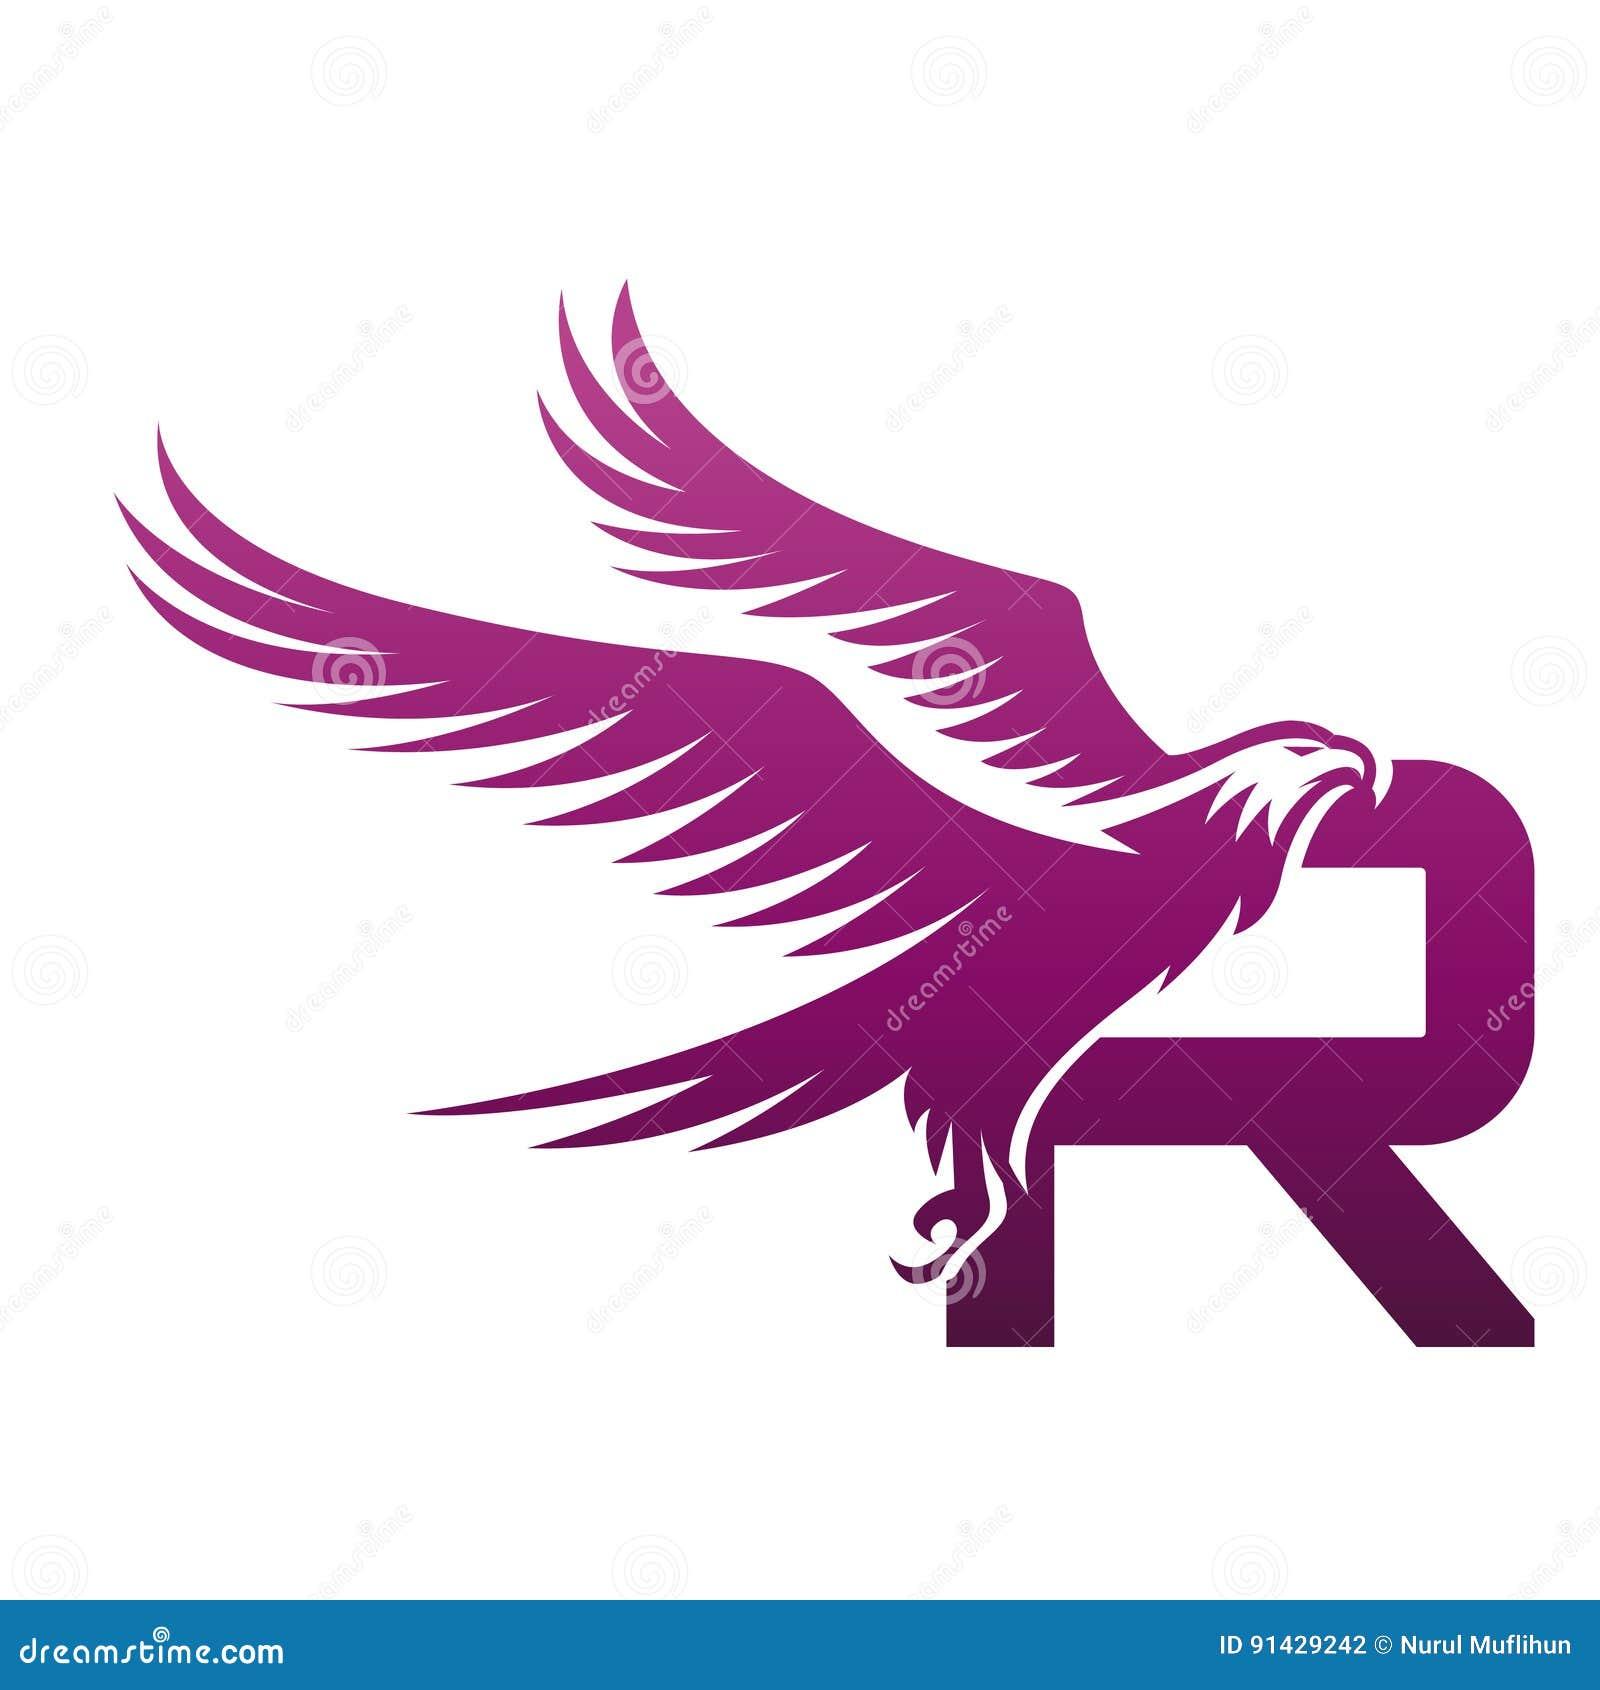 Vector purple brave hawk initial r logo stock illustration download comp altavistaventures Image collections